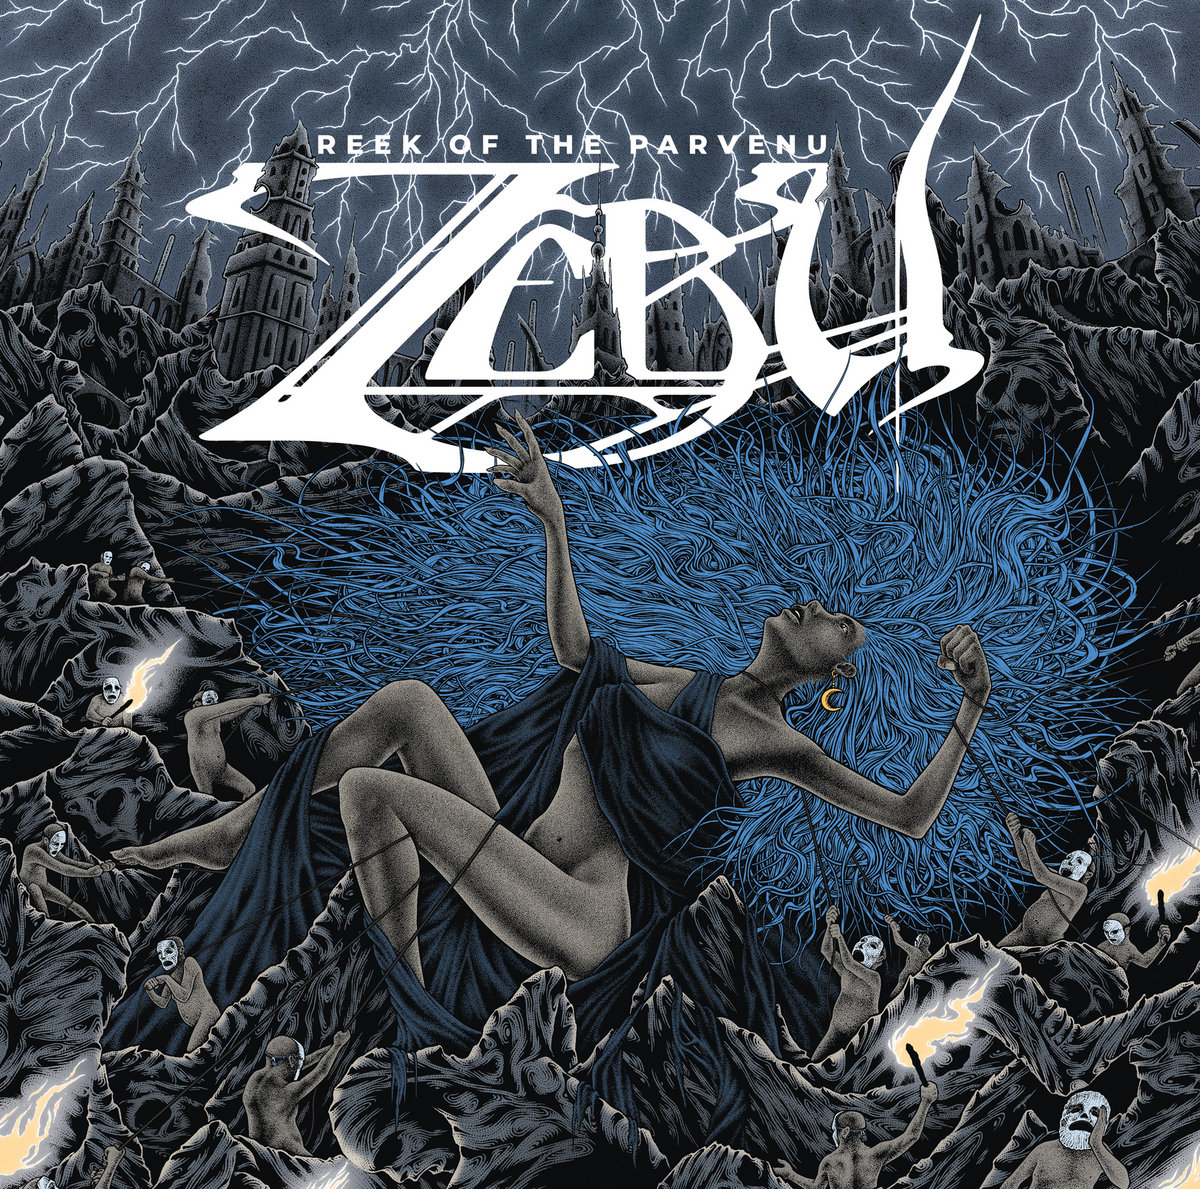 zebu reek of the parvenu